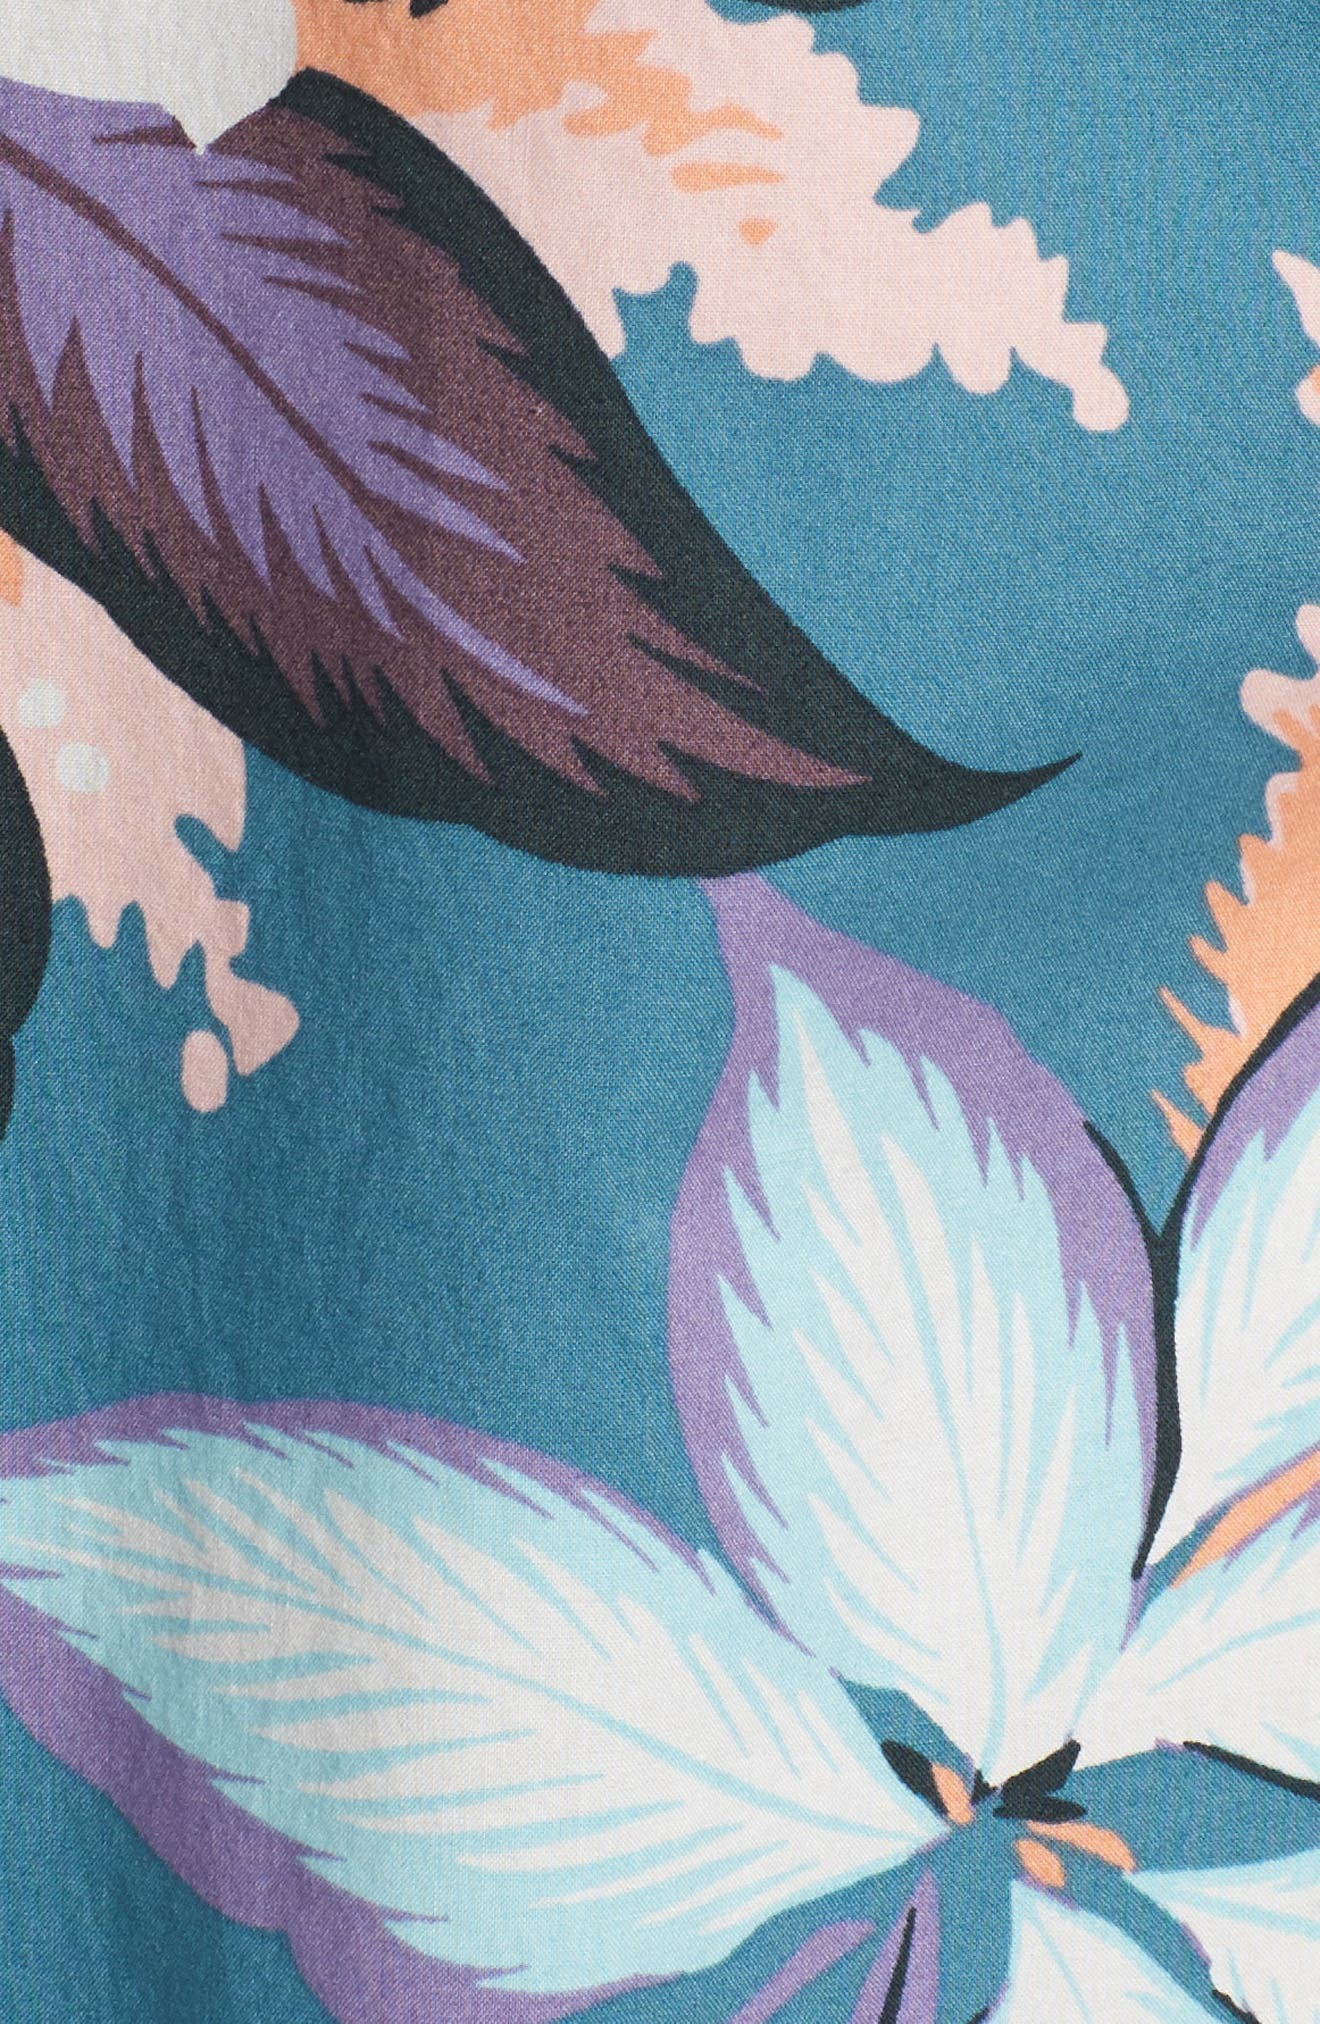 Riviera Slim Fit Floral Print Sport Shirt,                             Alternate thumbnail 5, color,                             Coral Couch Floral - Blue